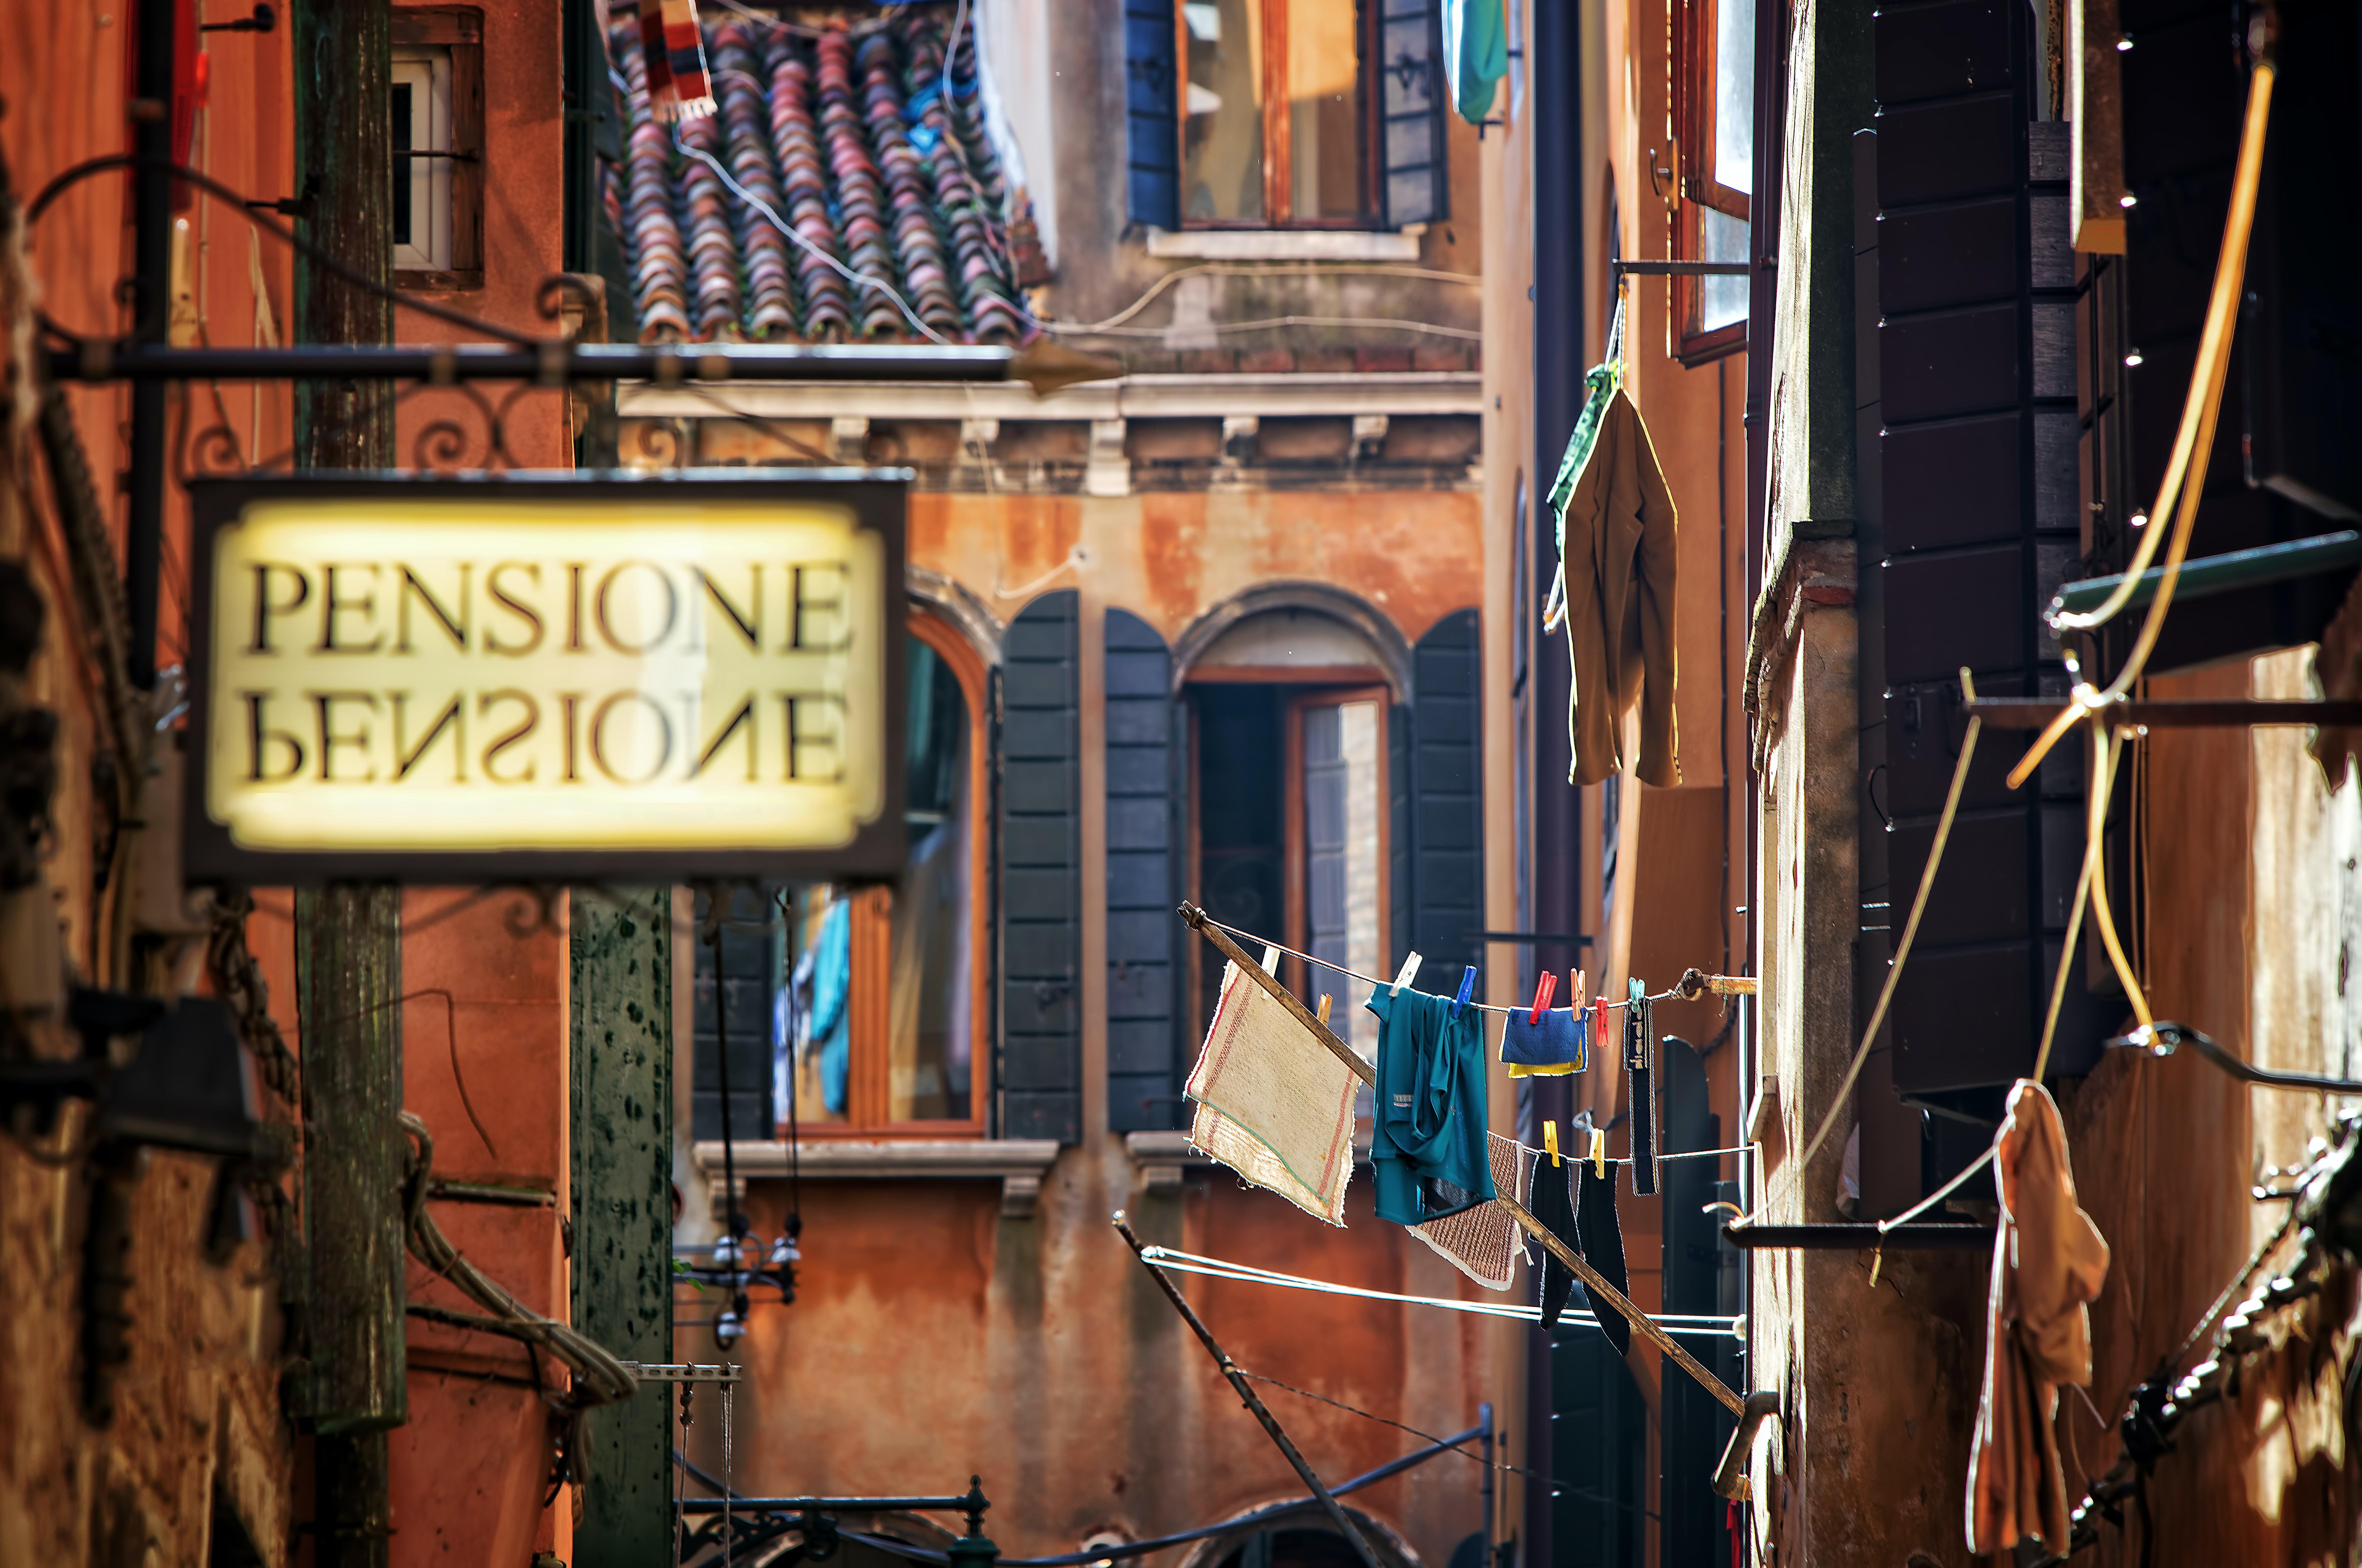 pensione signage near brown concrete building